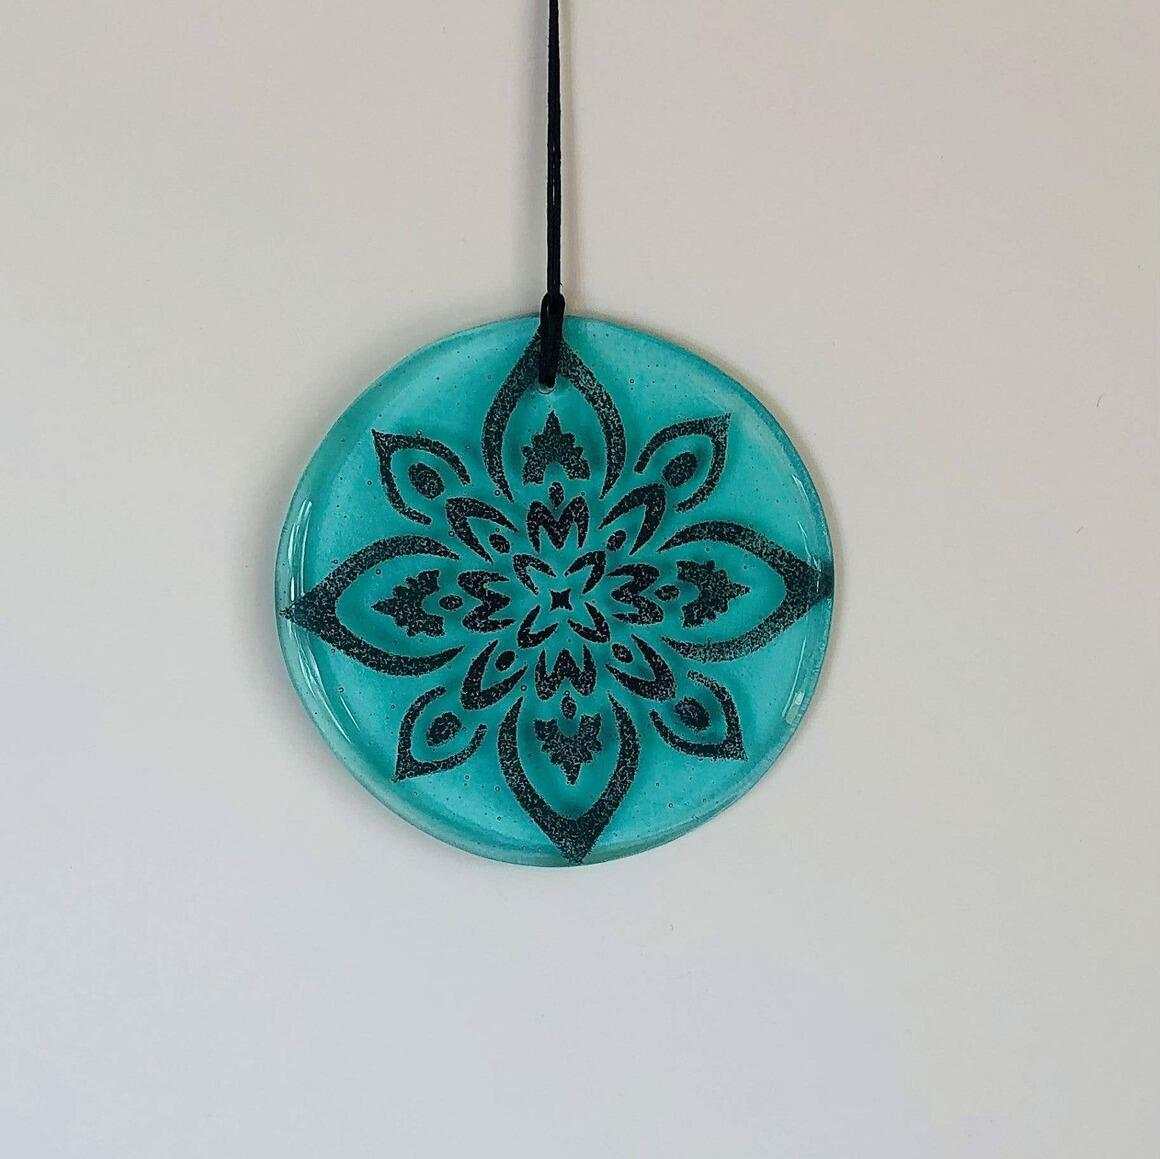 Glass Mandala Window Ornament Suncatcher - Aquamarine | Trada Marketplace